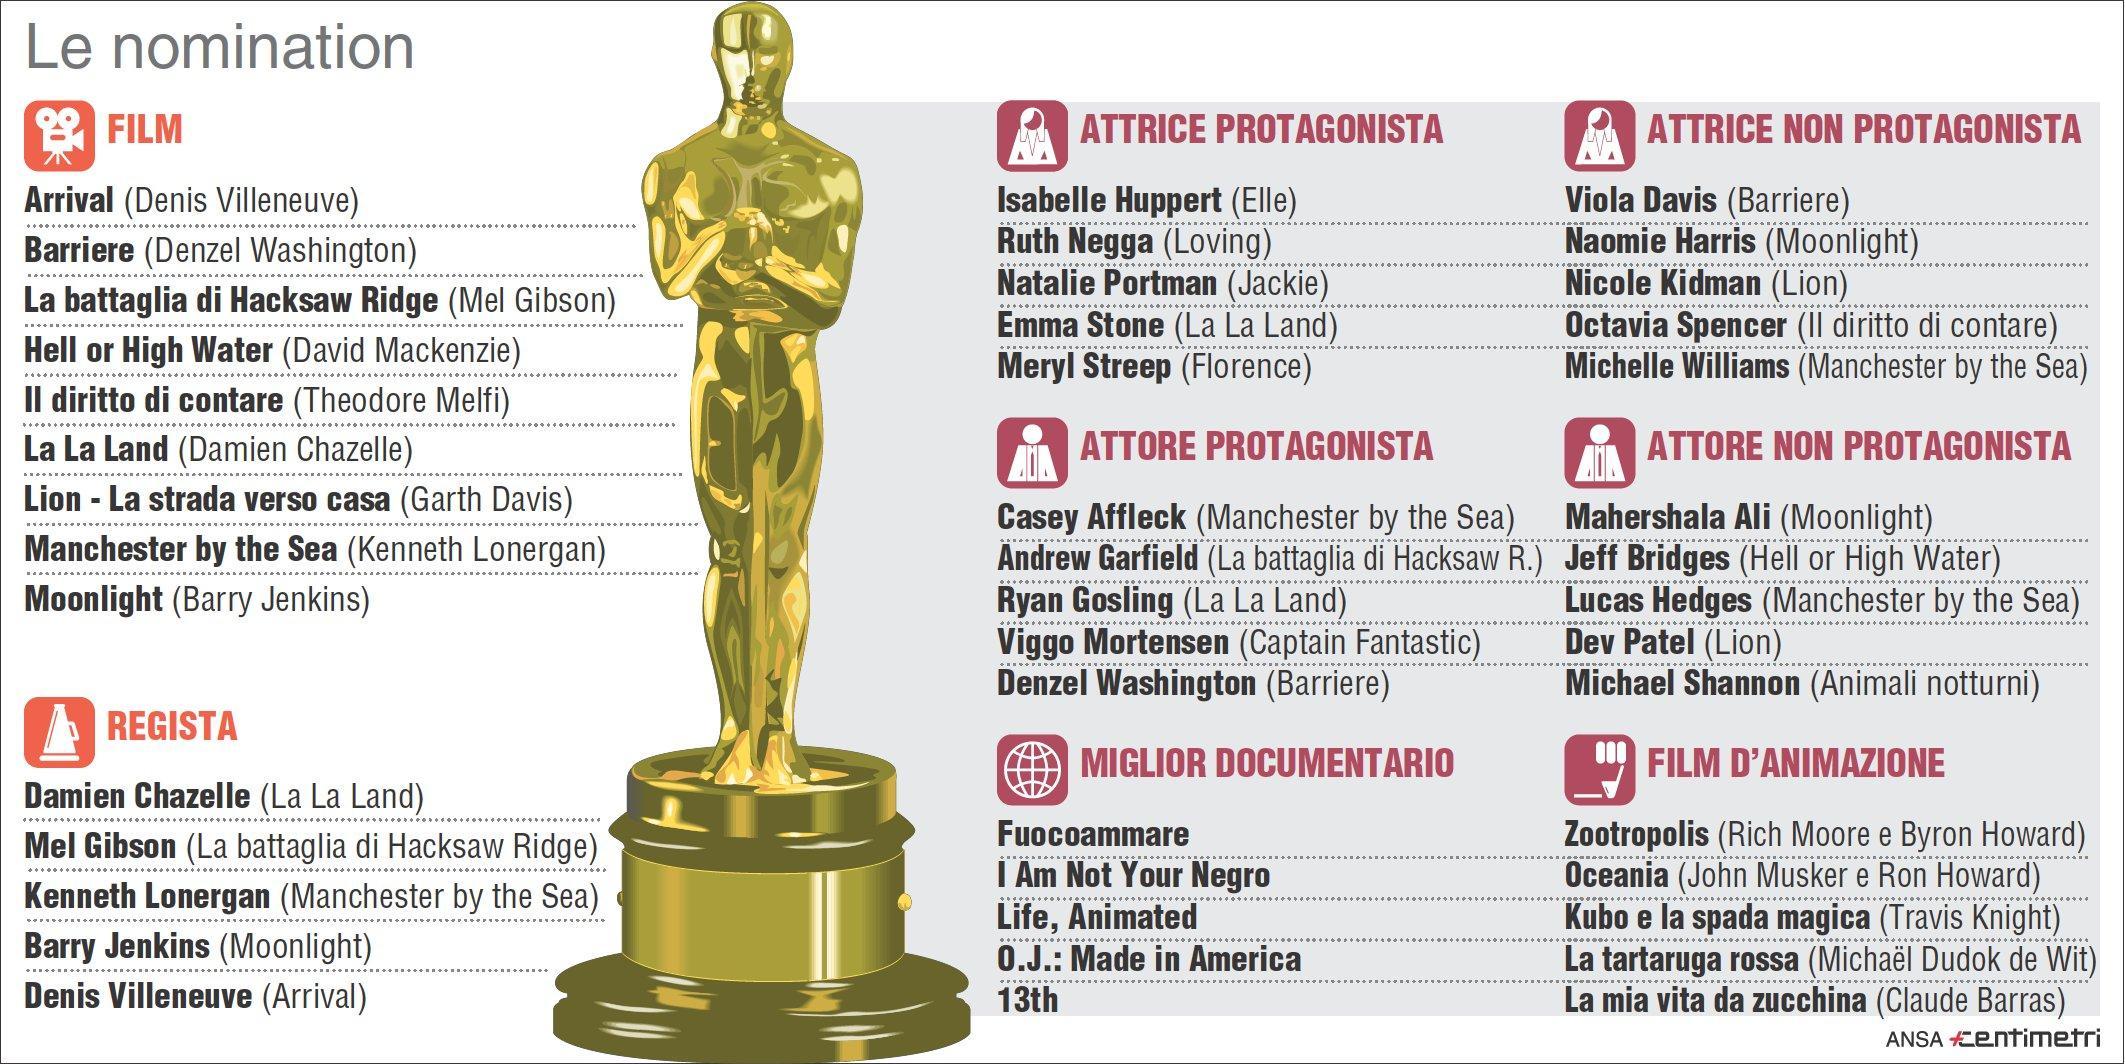 Oscar 2017, ecco tutte le nomination